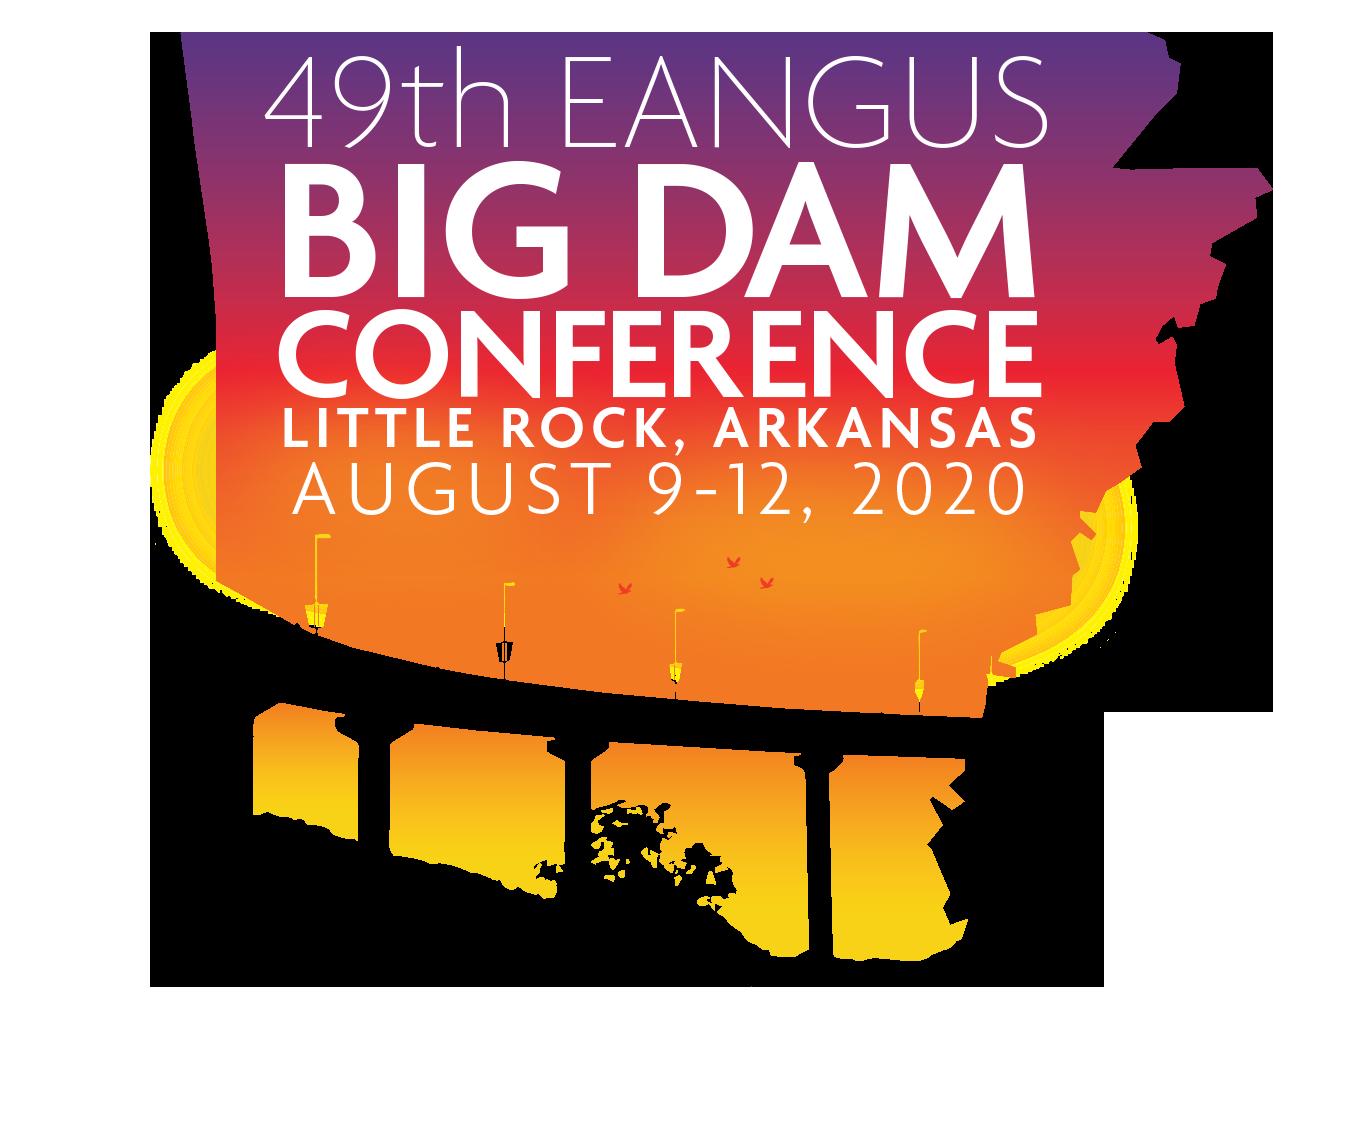 2020 Conference Bulk Registrations   EANGUS Conference